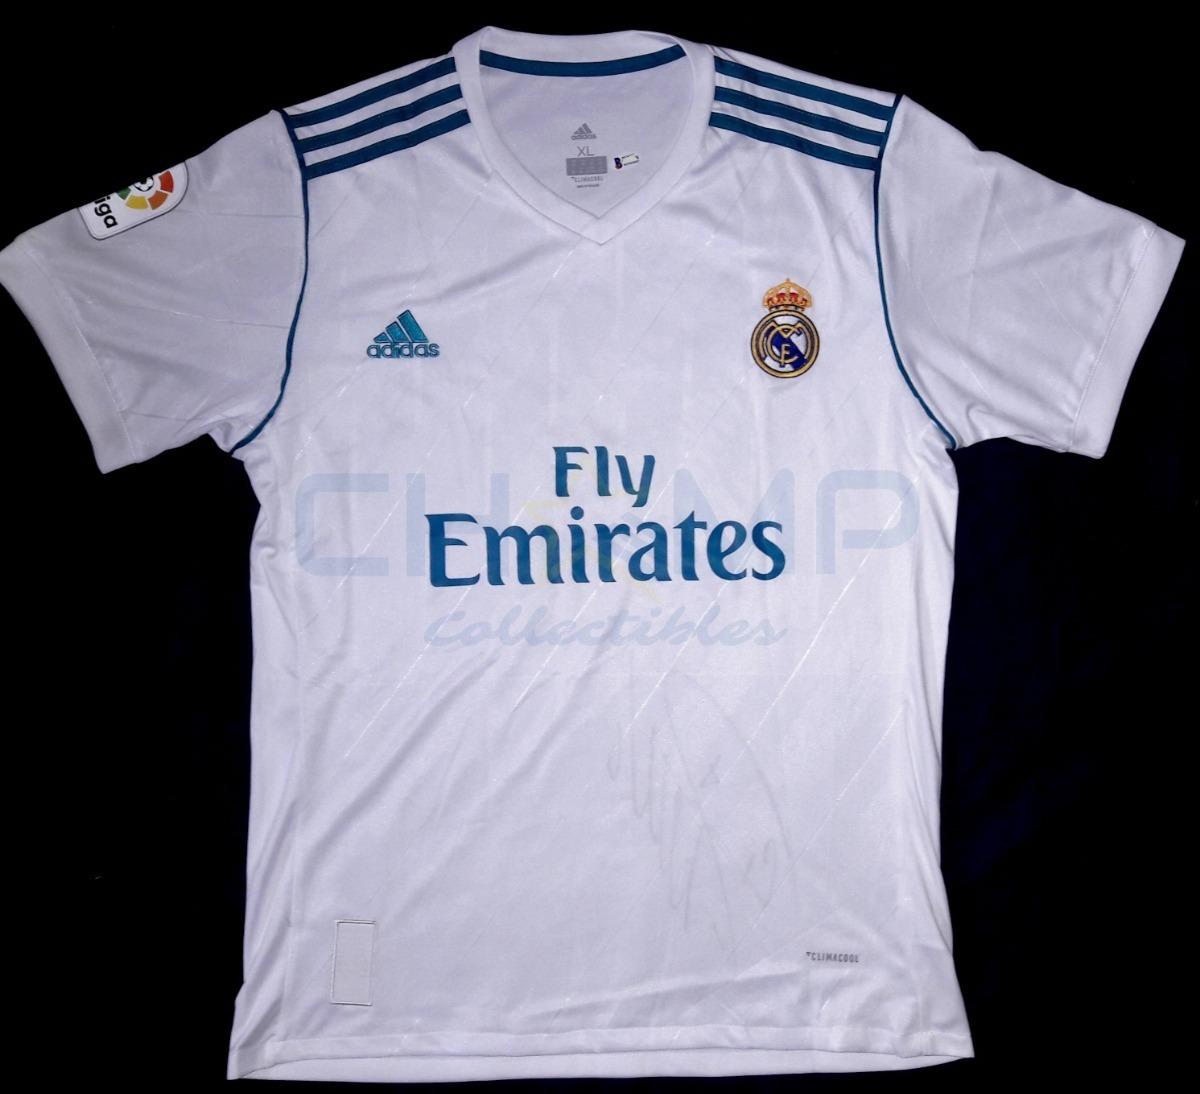 huge discount 75c19 decf0 Jersey Autografiado Cristiano Ronaldo Real Madrid 207-18 Cr7 adidas  Tricampeonato Champions League Firma Grande Beckett